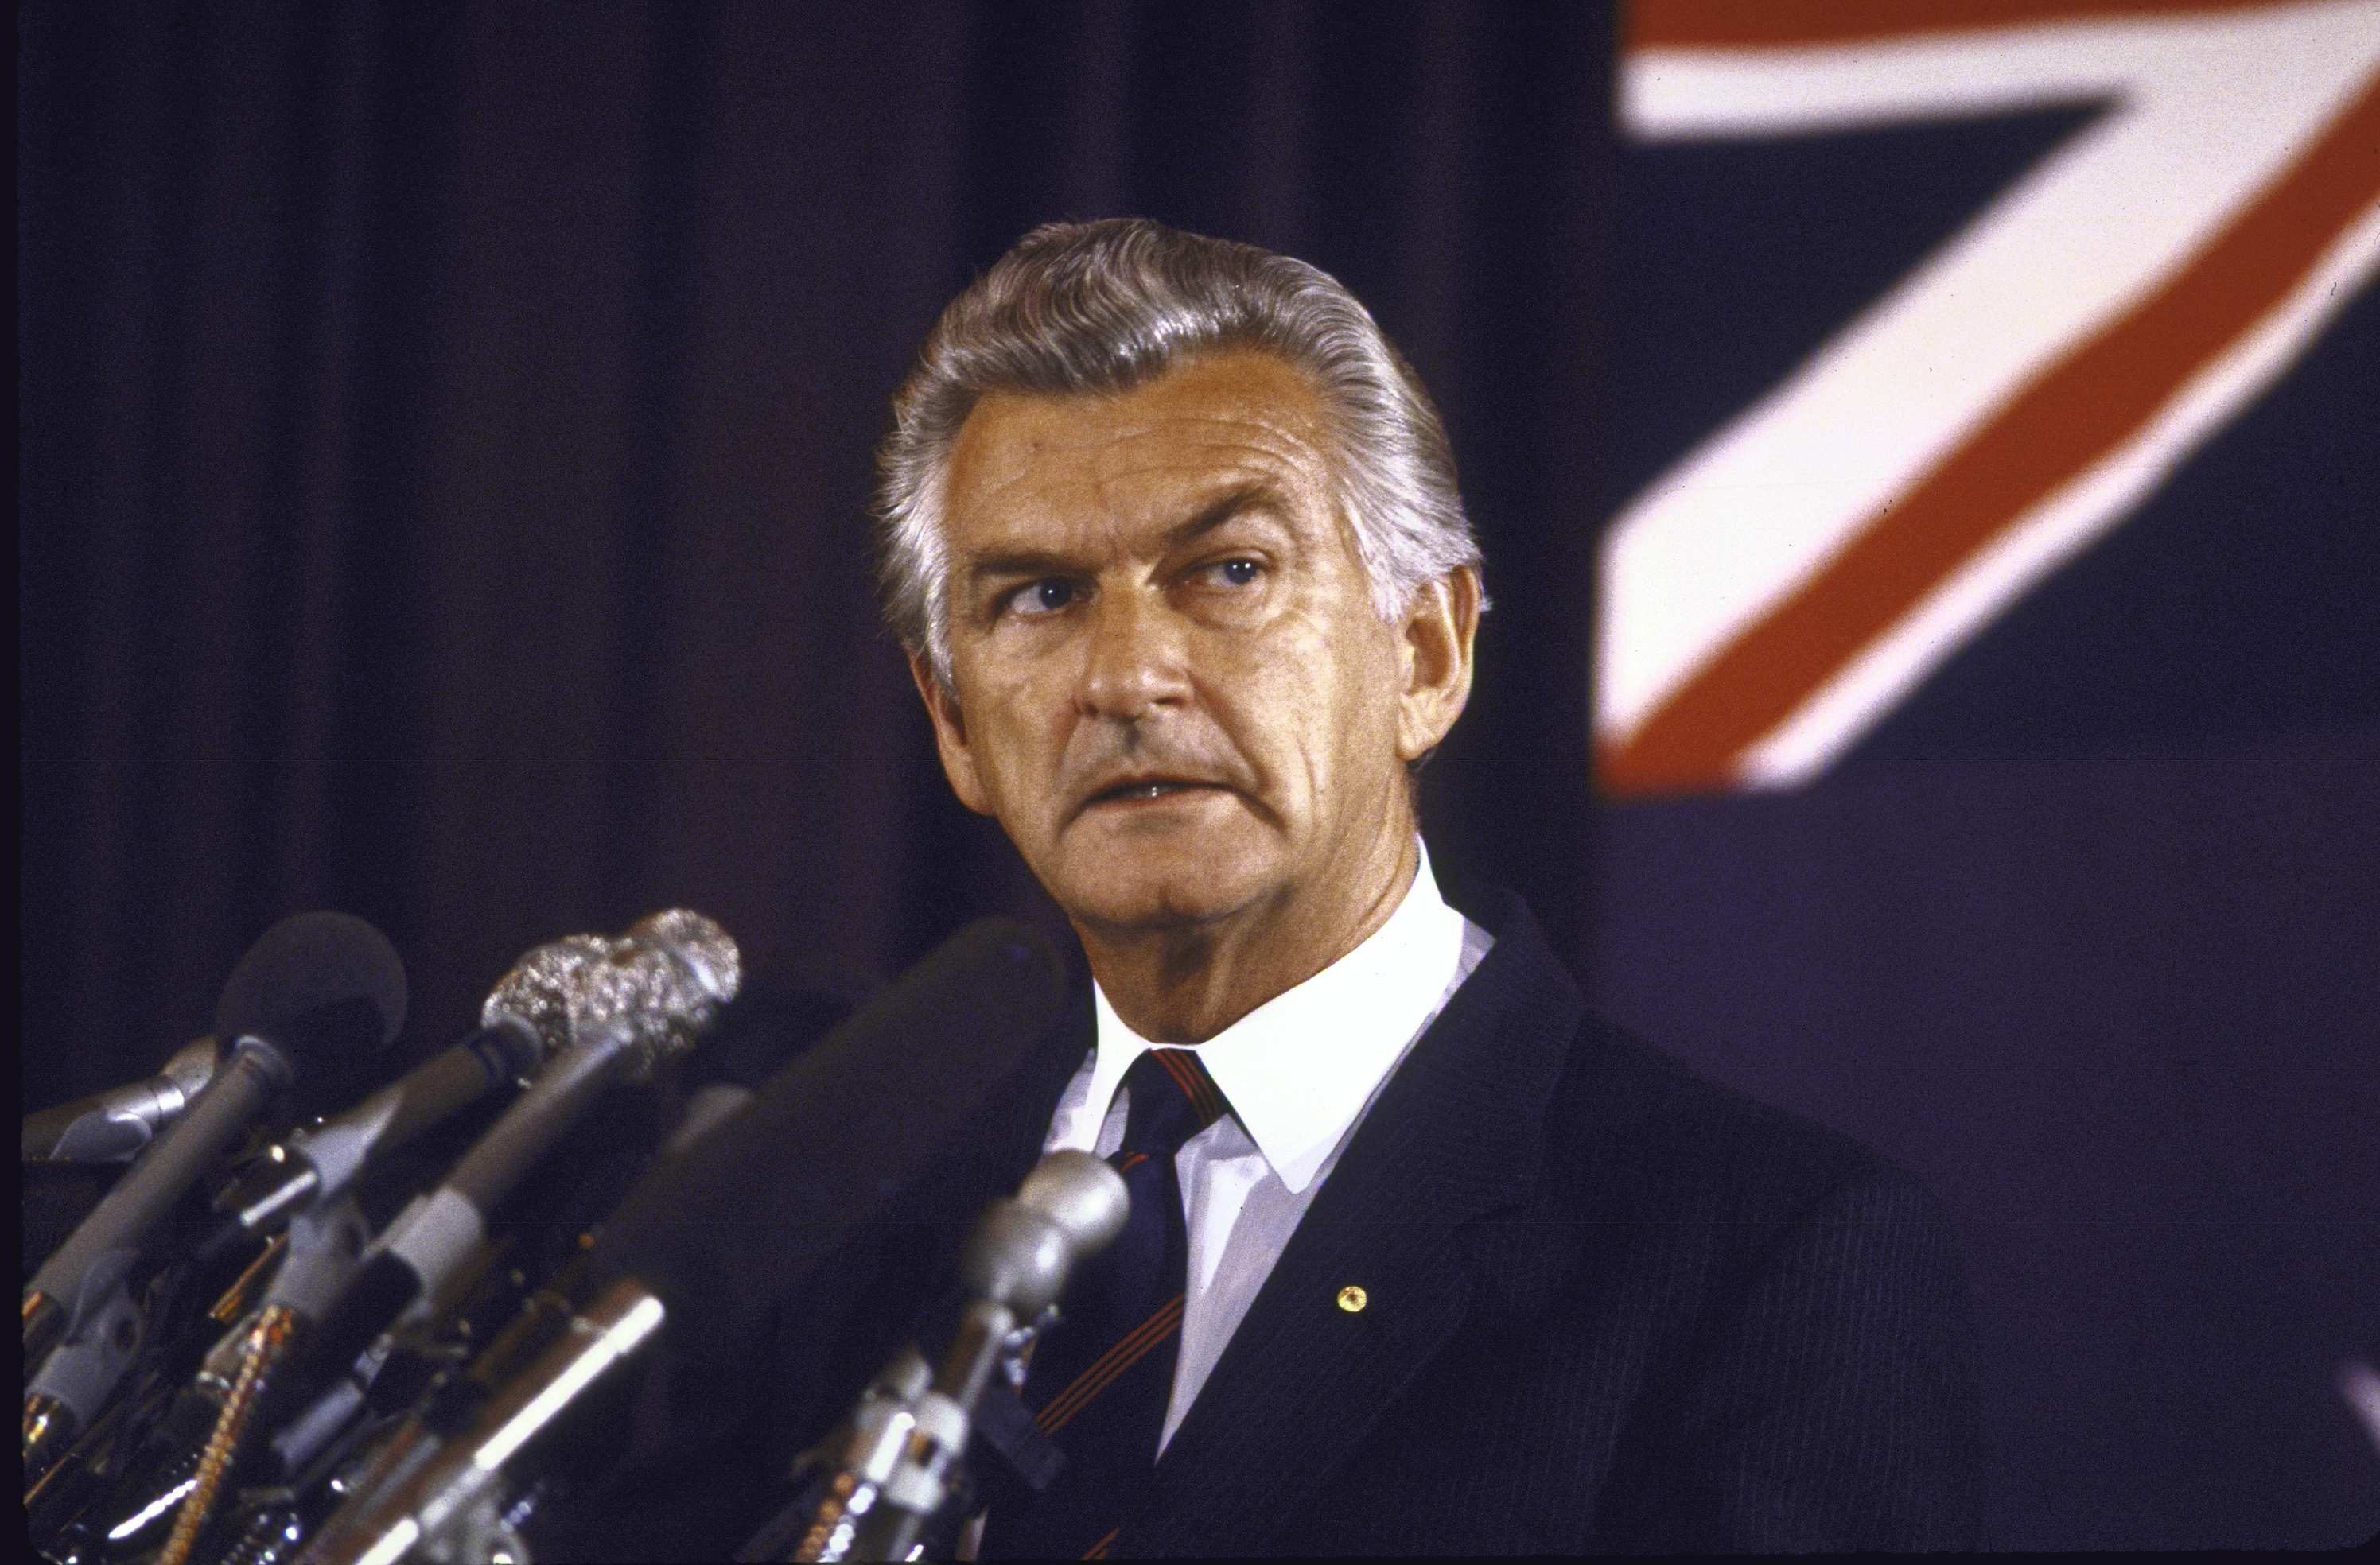 Former Australian Prime Minister Bob Hawke Dead at 89